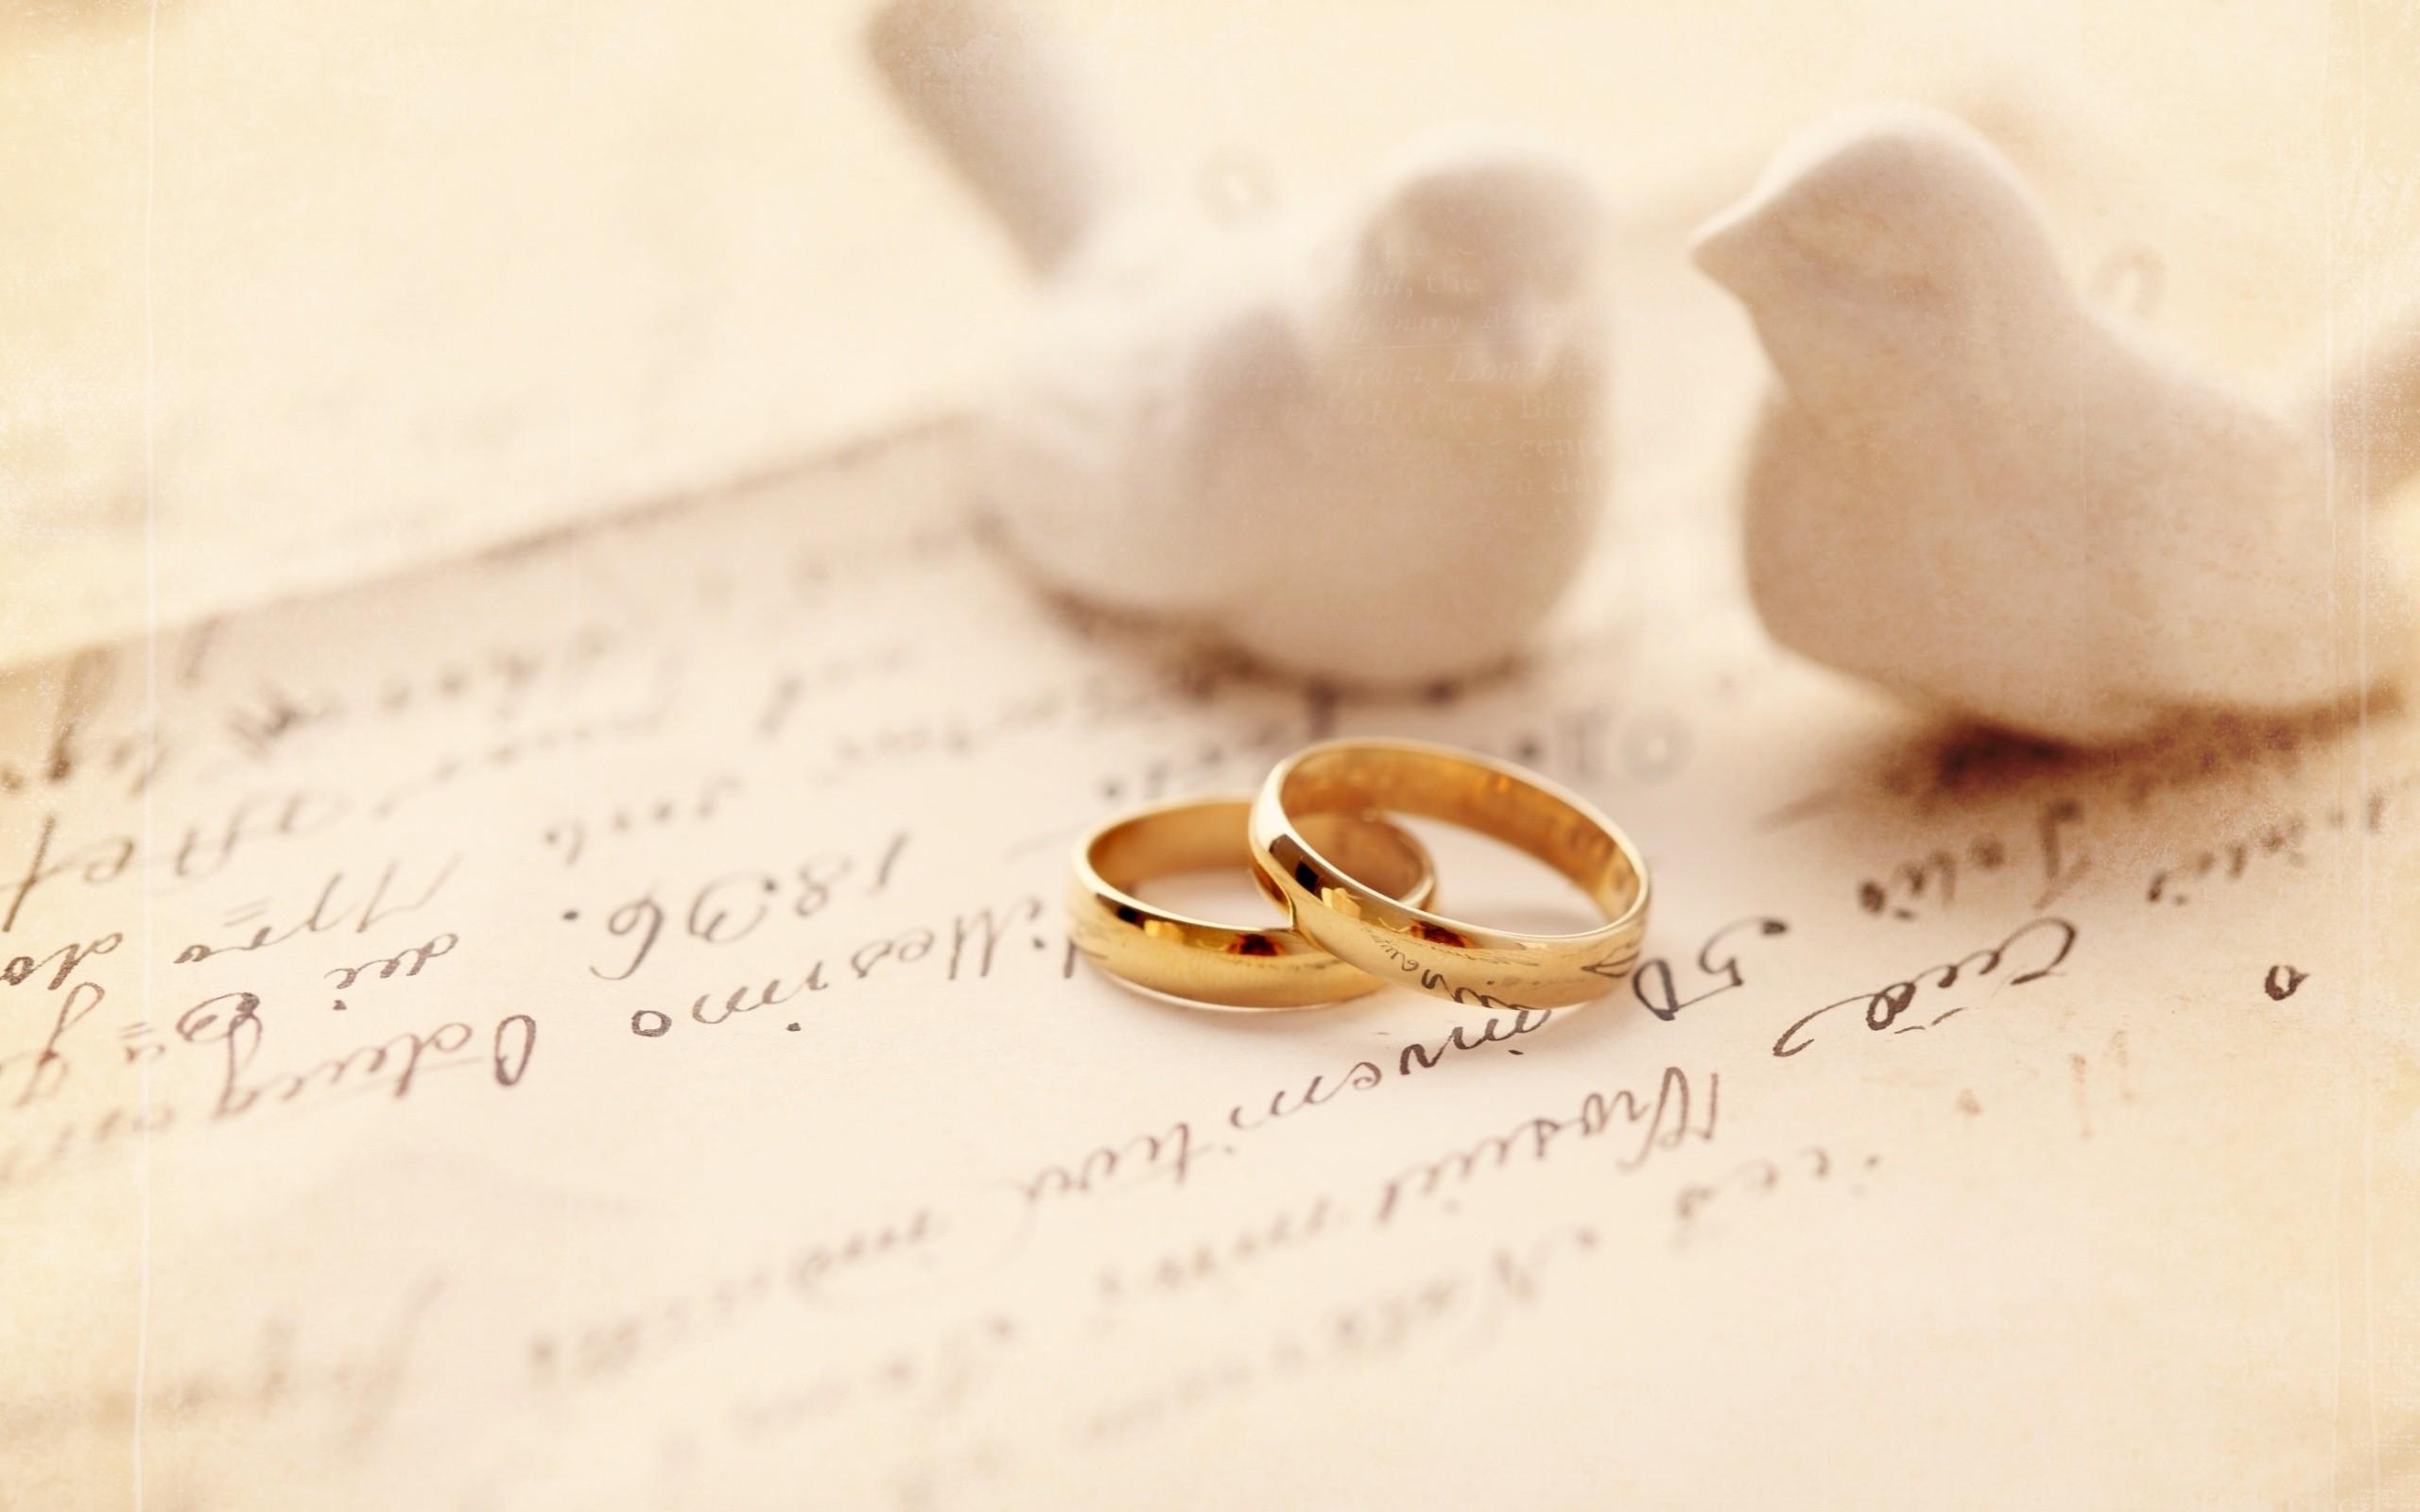 Gold Ring Love Wedding Wallpaper PC 7929 Wallpaper High Resolution 2560x1600